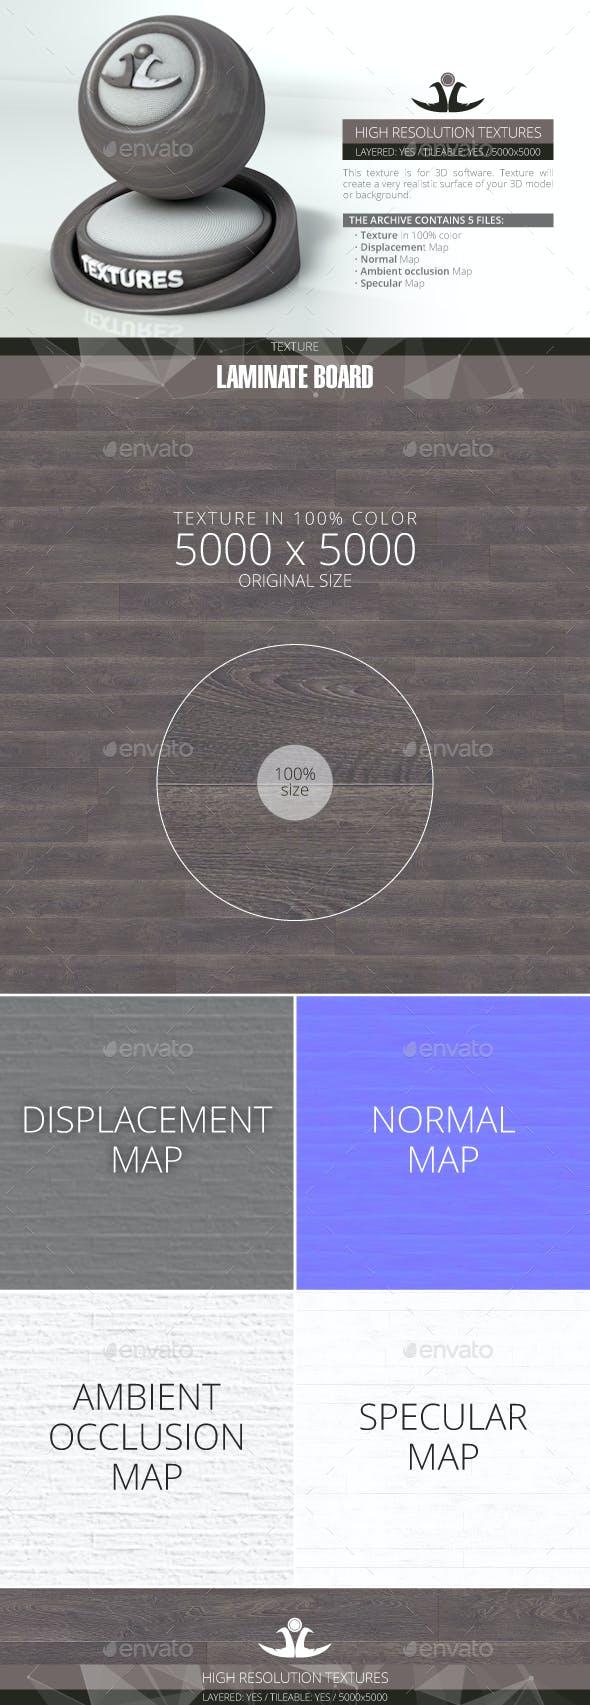 Laminate Board 37 - 3DOcean Item for Sale